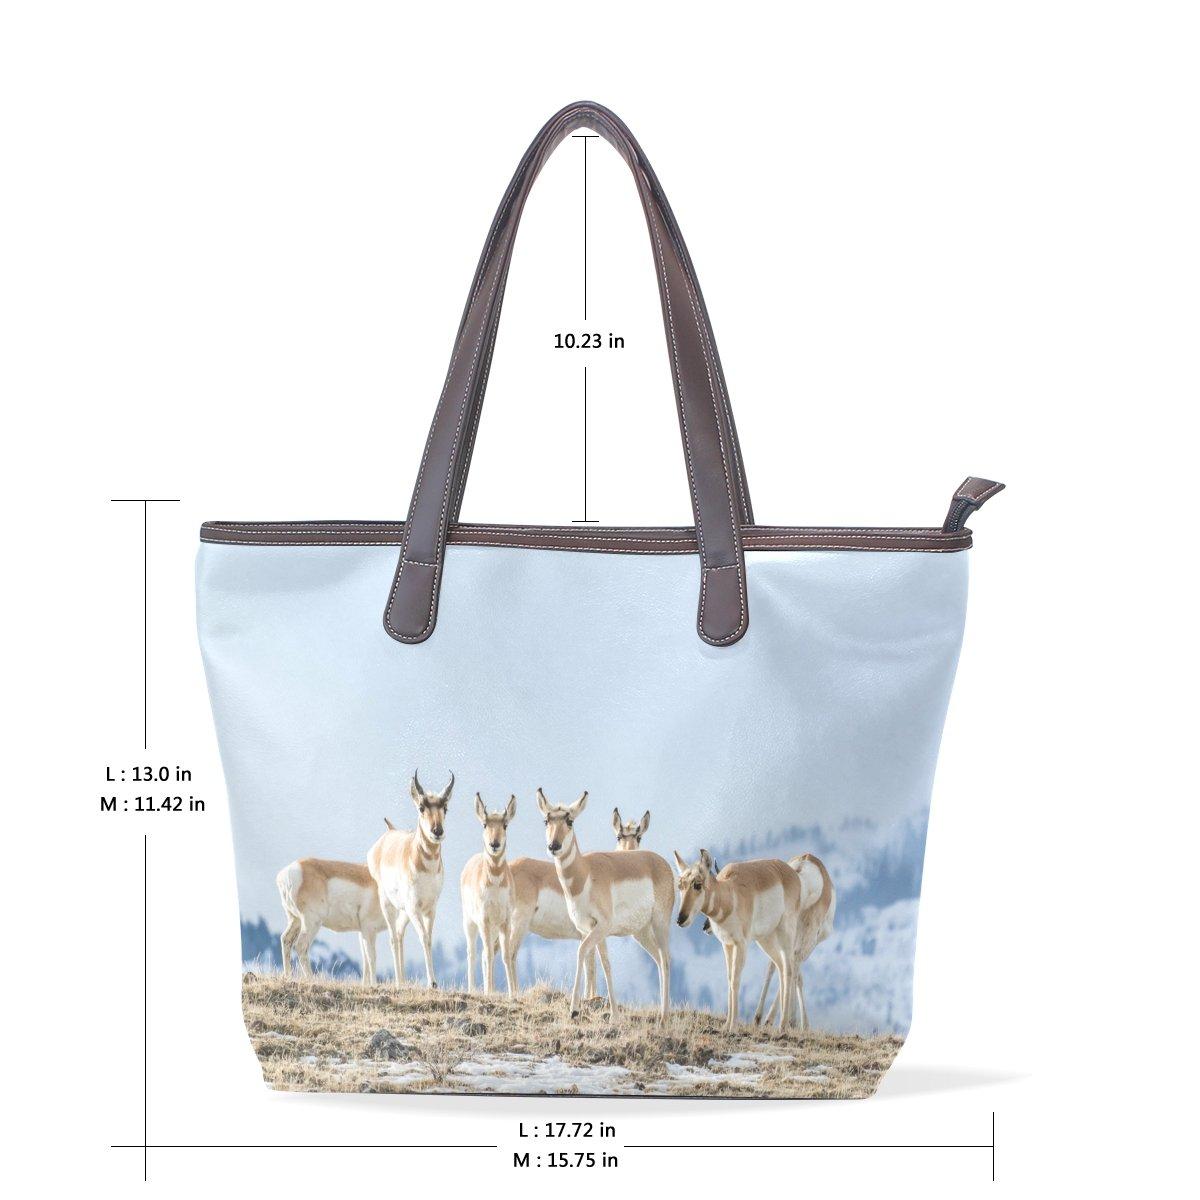 Ye Store Group Of Pronghorn Antelopes Lady PU Leather Handbag Tote Bag Shoulder Bag Shopping Bag